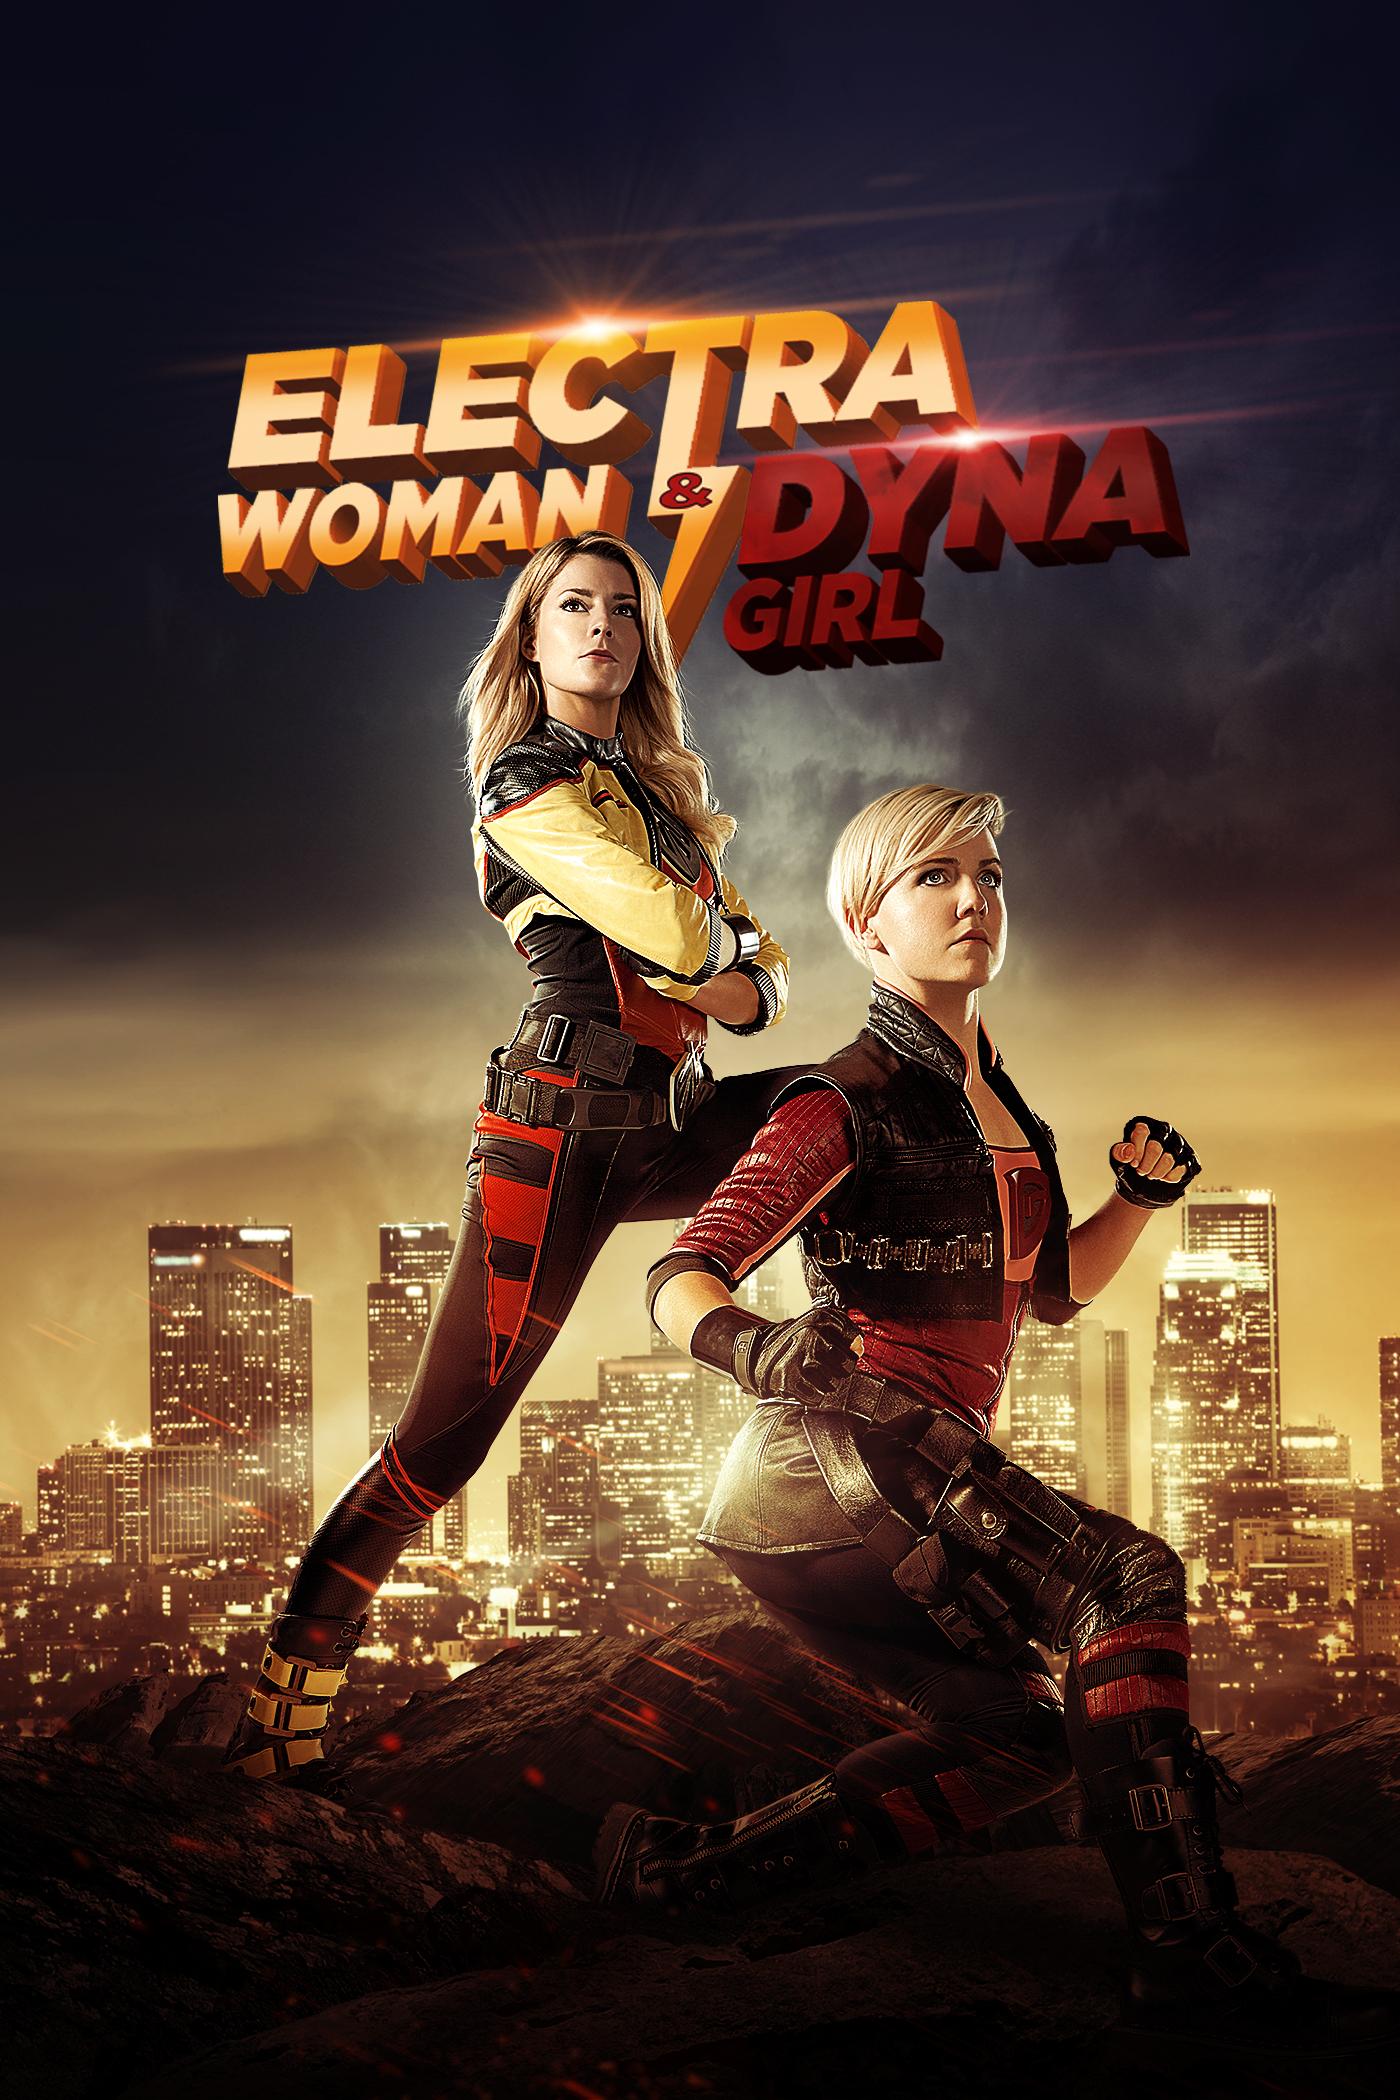 Electra Woman & Dyna Girl (2016)